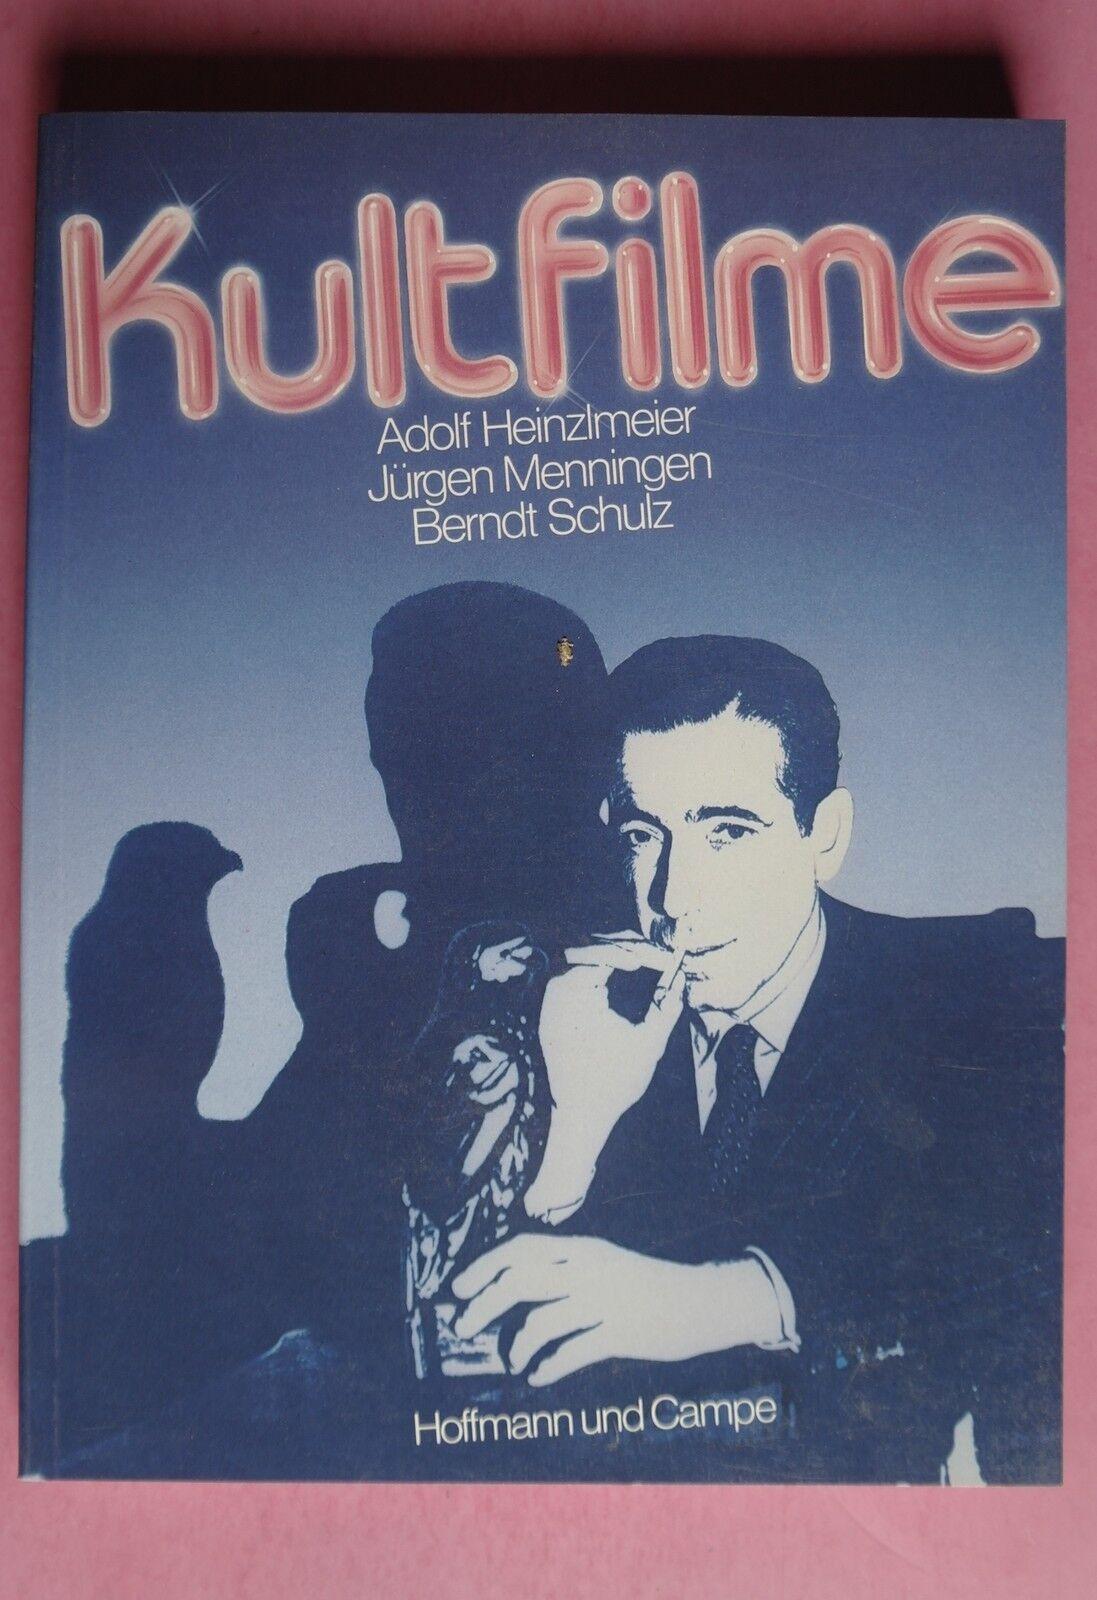 (R13_0) KULTFILME Casablanca/Easy Rider/Dracula etc. 1989 - Adolf Heinzlmeier